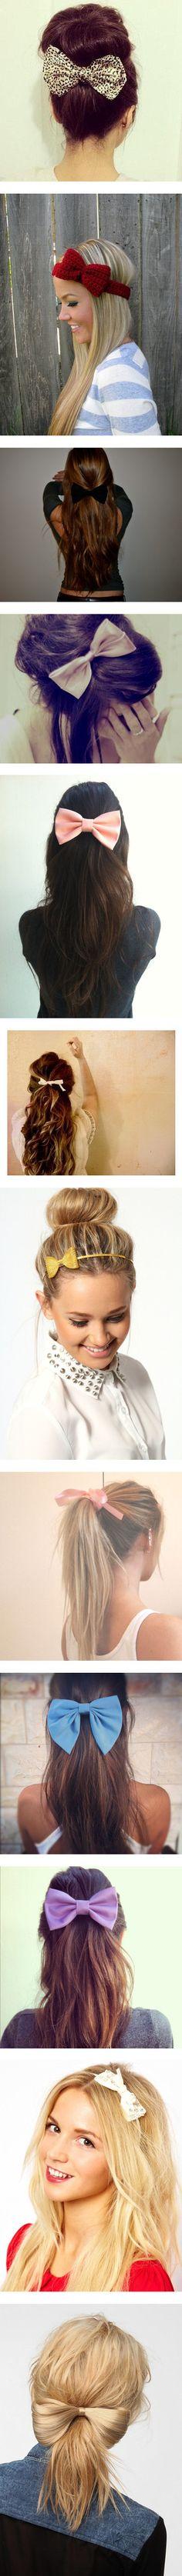 ways to wear a bow.